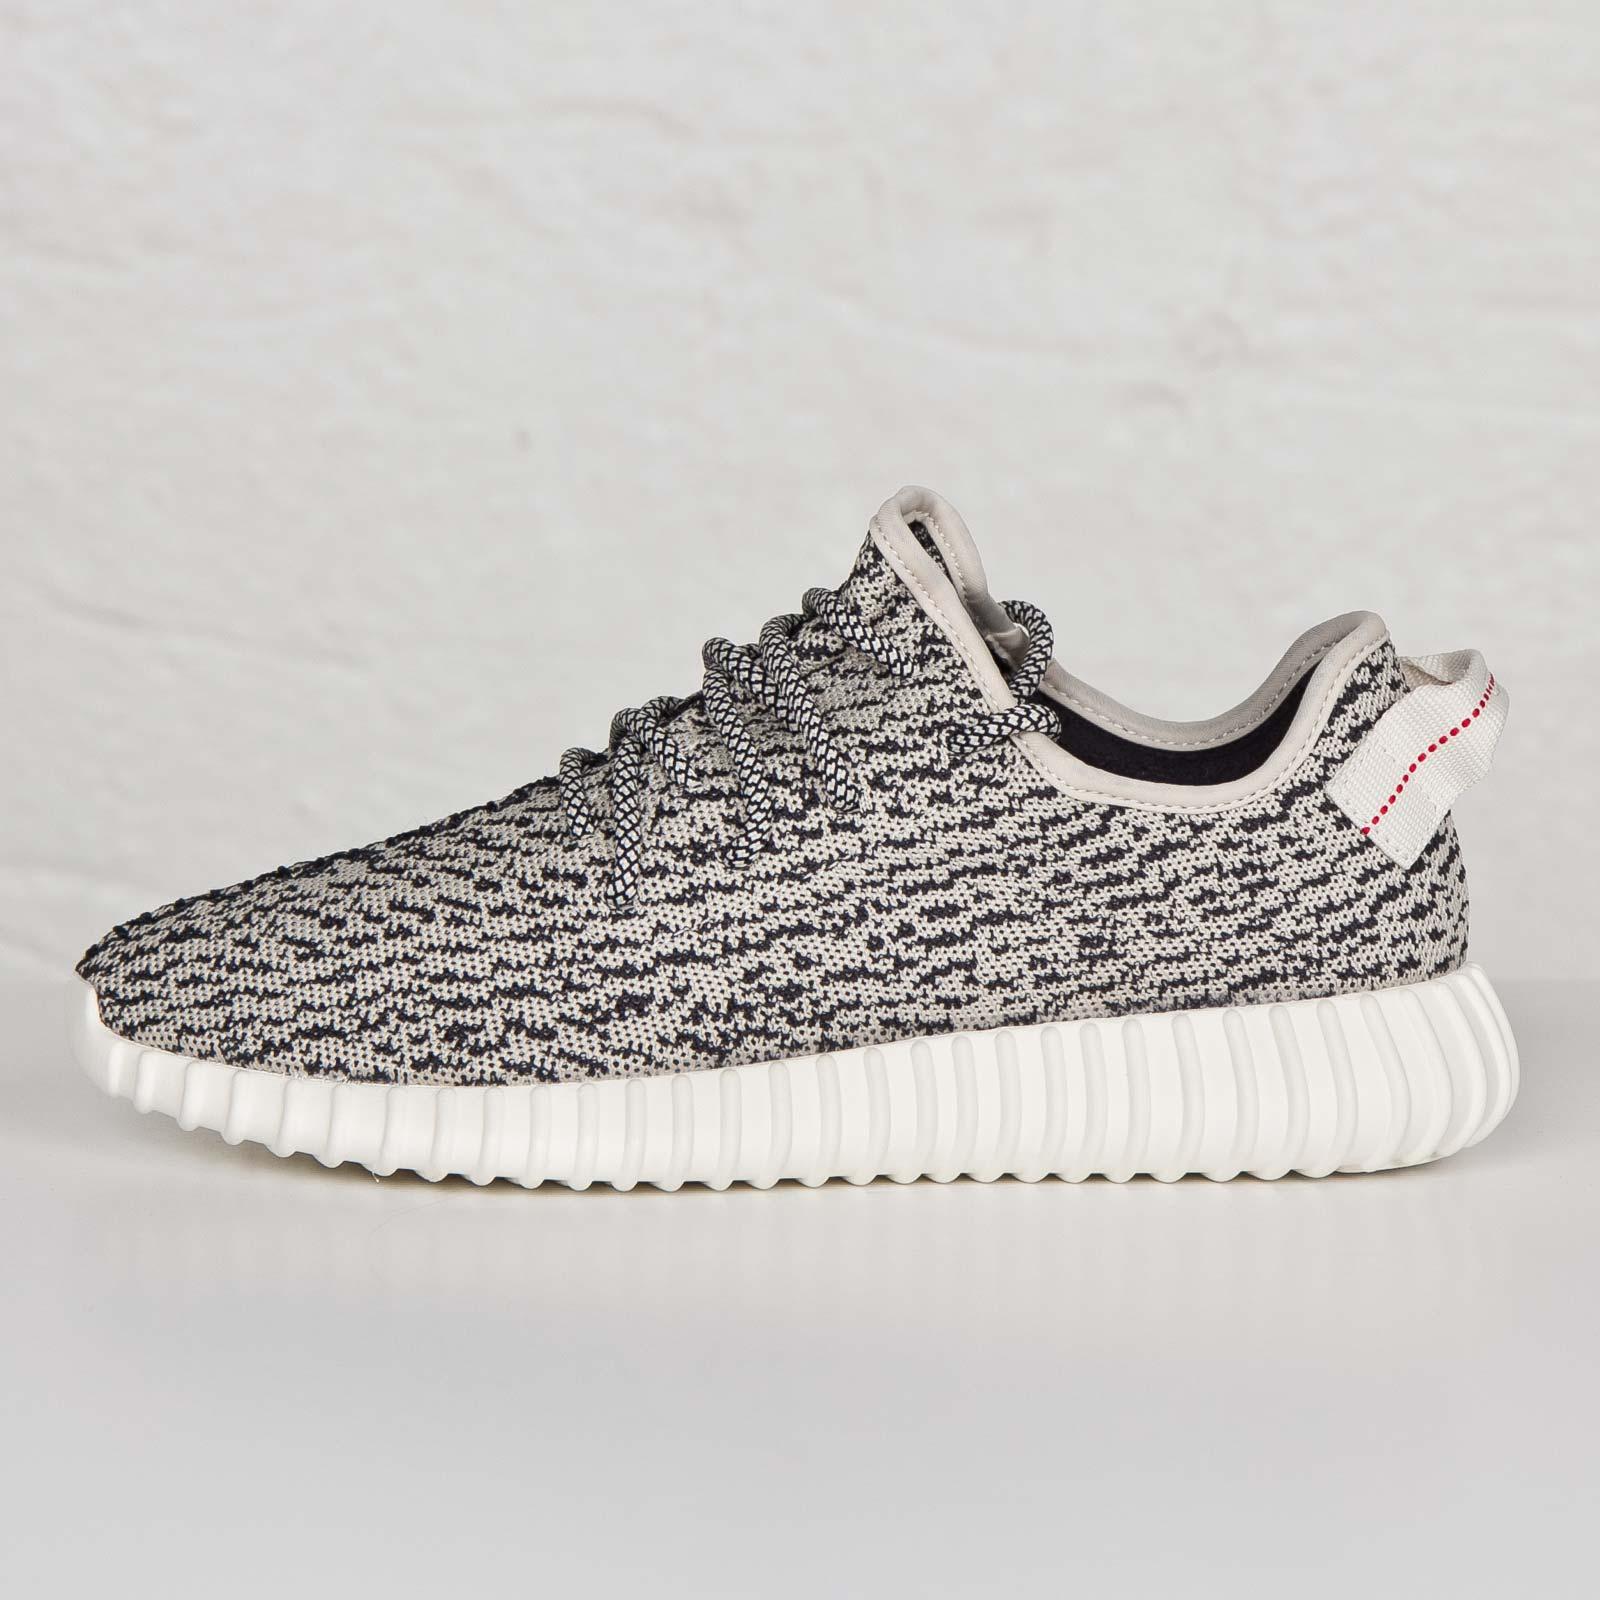 1ebb8798e05ce adidas Yeezy Boost 350 - Aq4832 - Sneakersnstuff